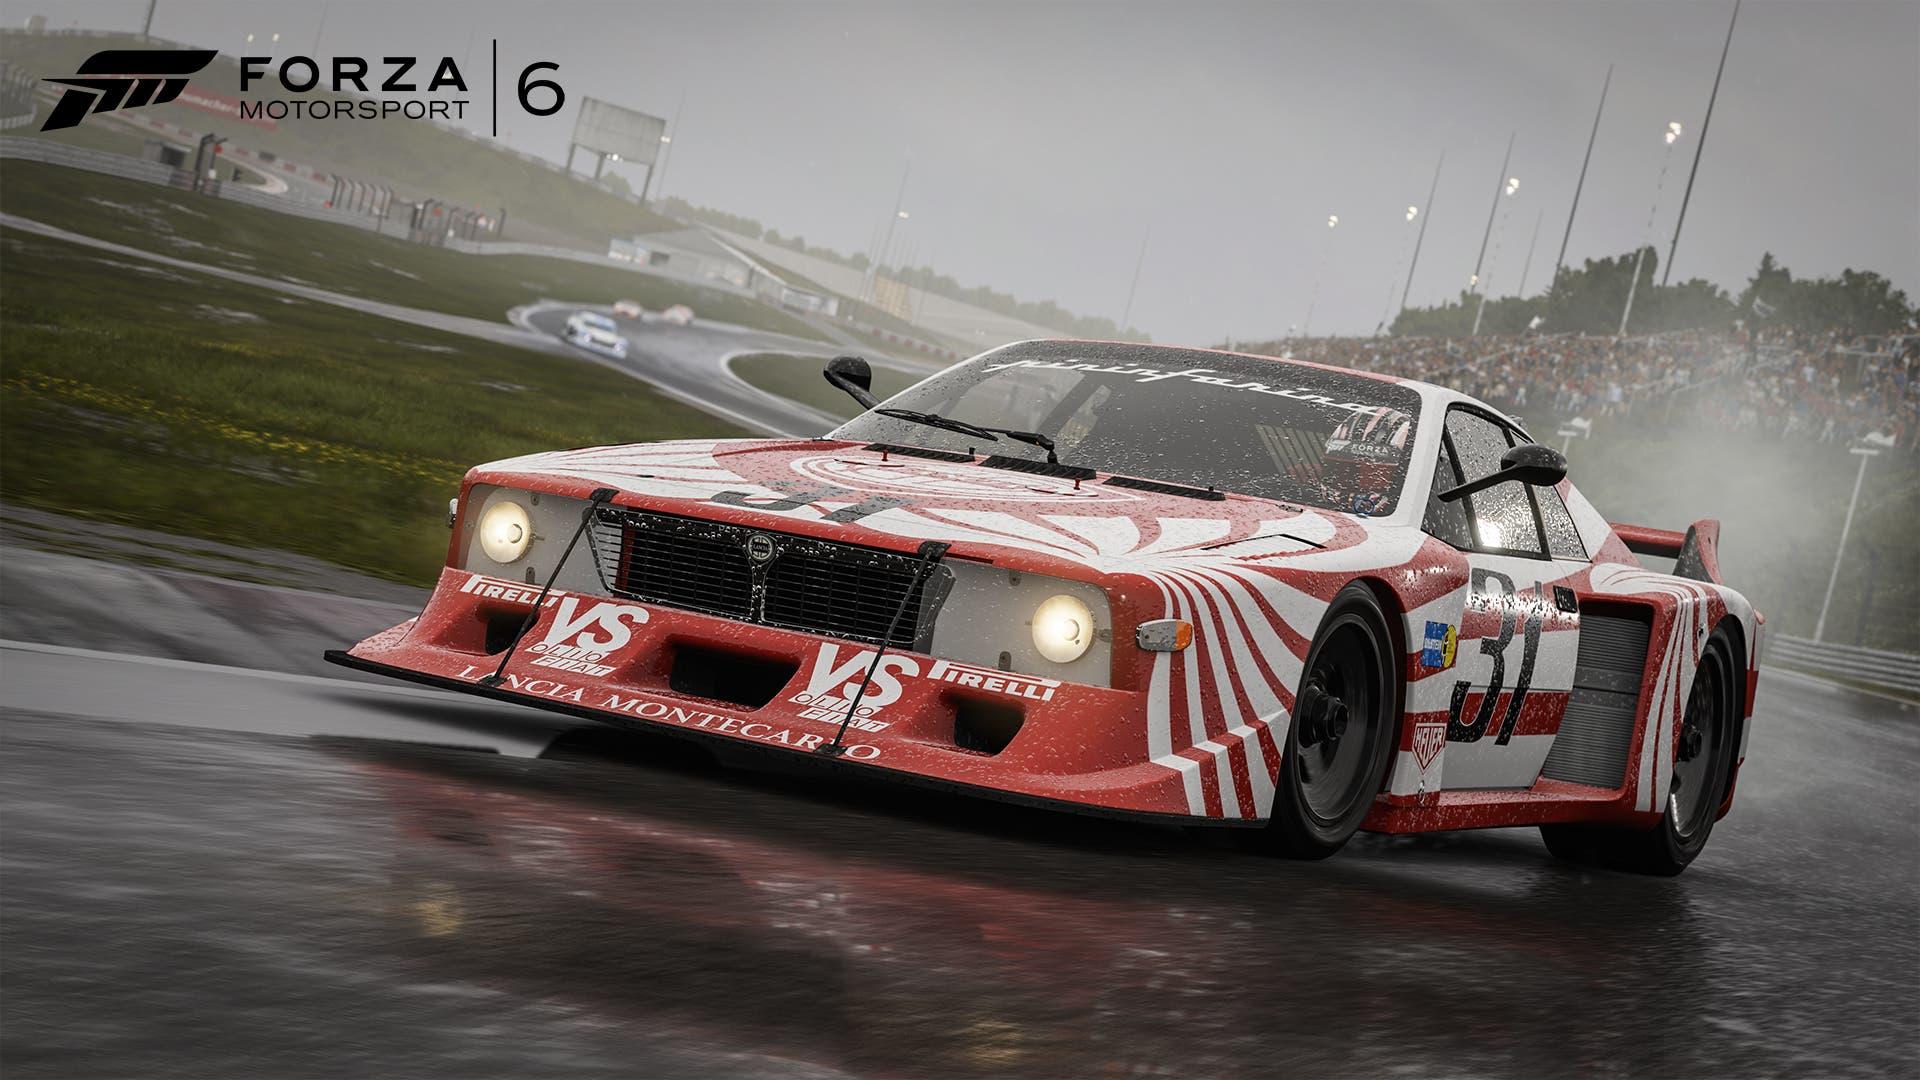 NovDLC_Lancia31BetaMontecarlo_Forza6_WM